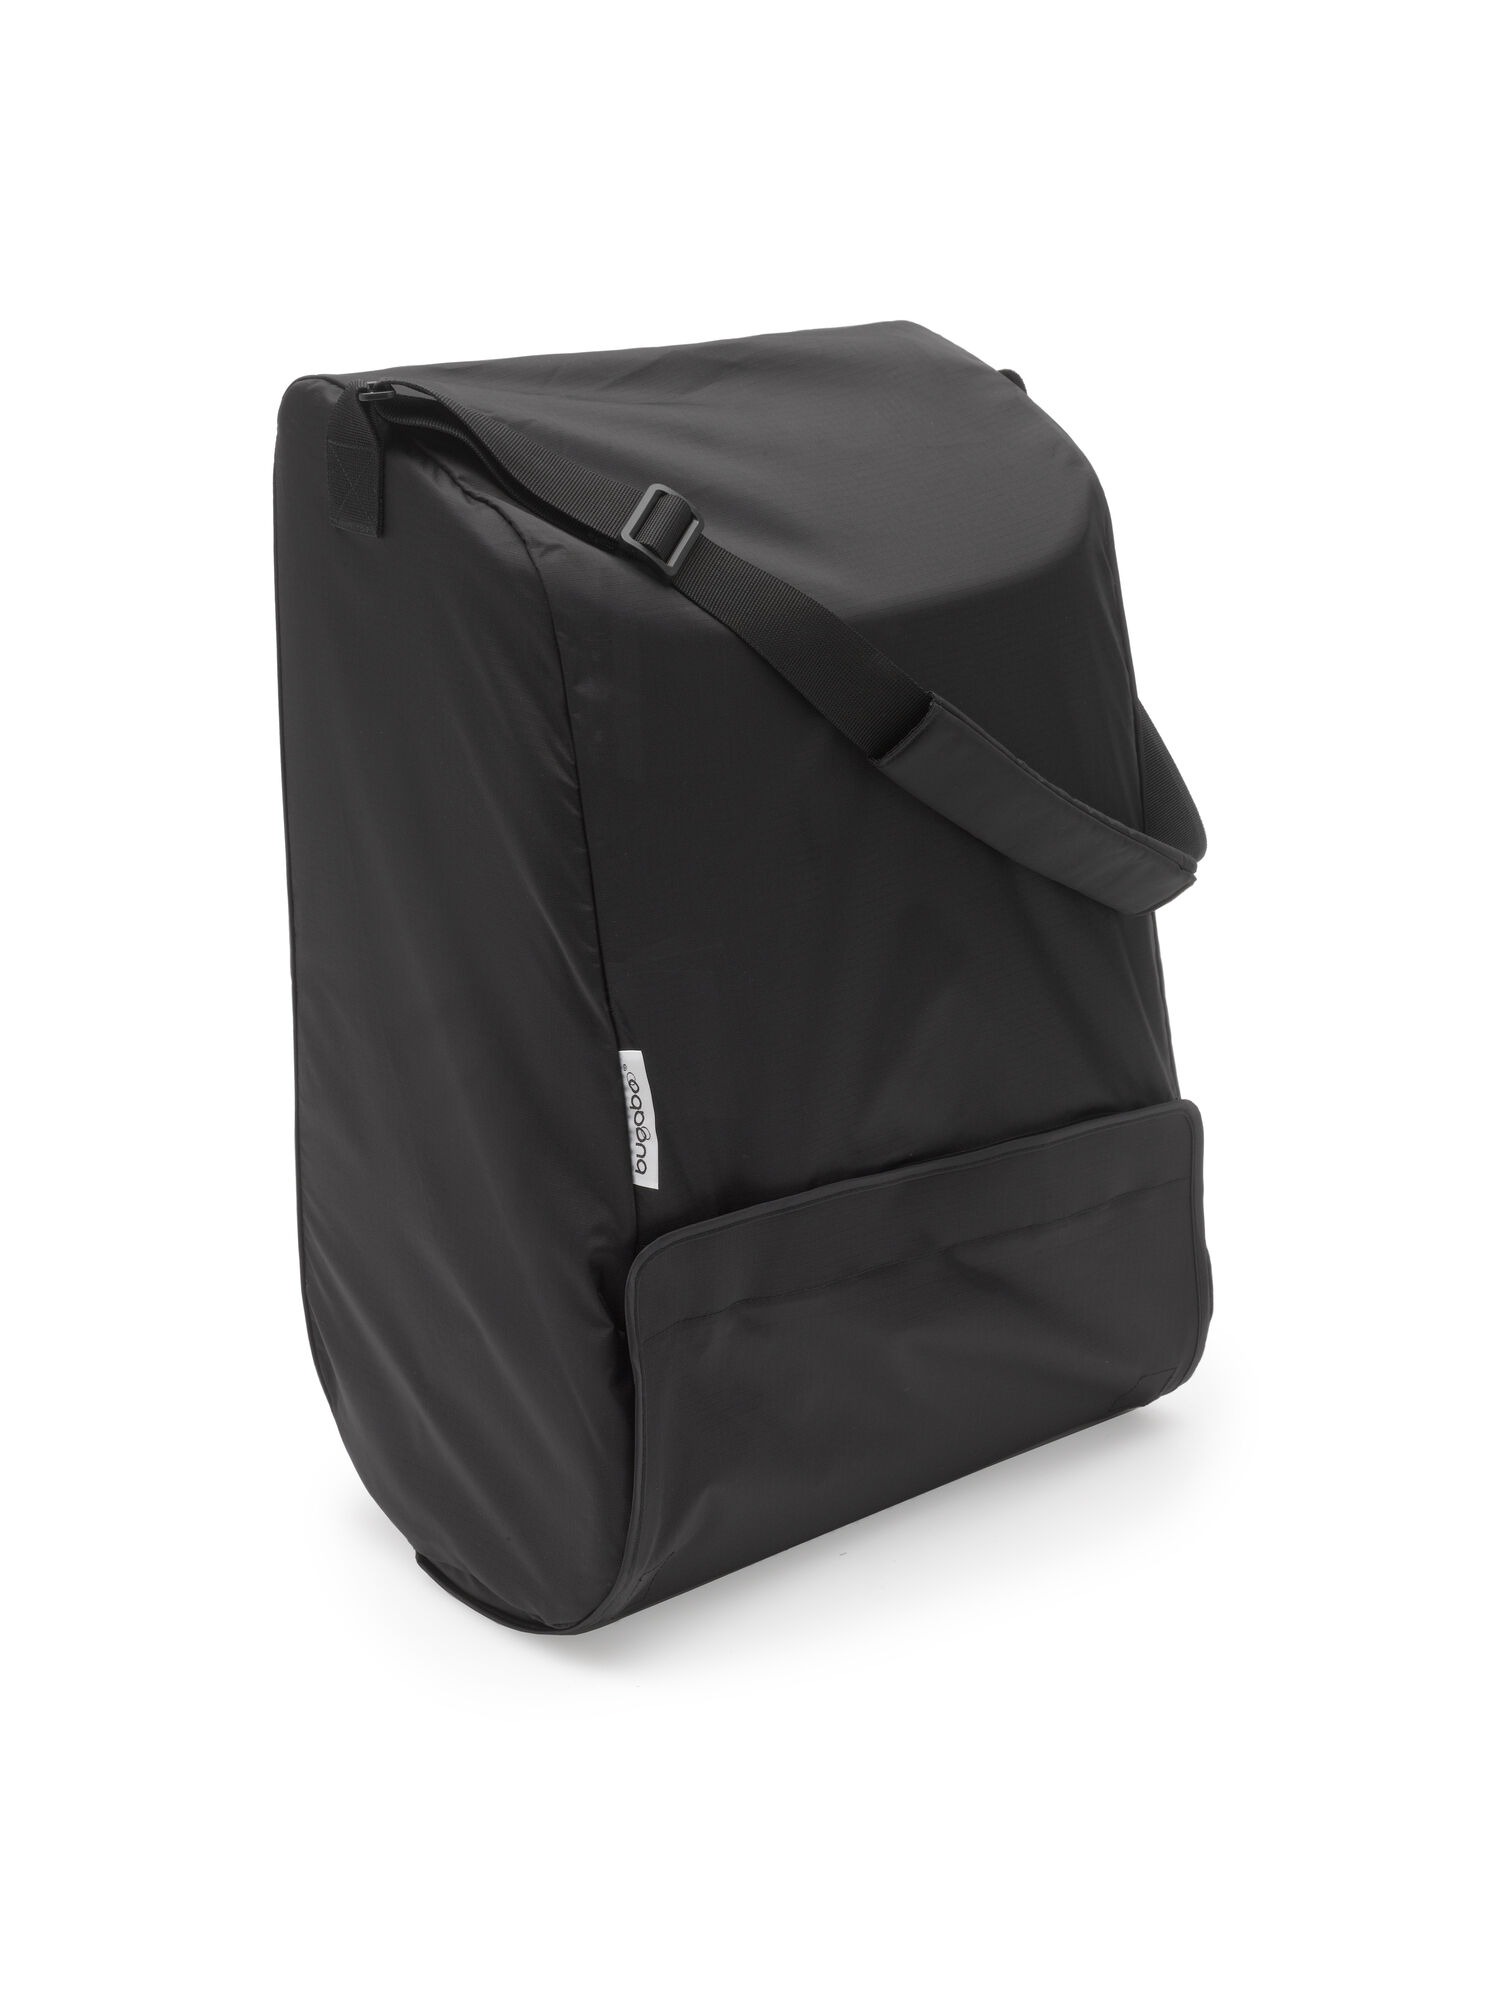 Bugaboo Ant Pushchair Stroller Buggy Transport Bag